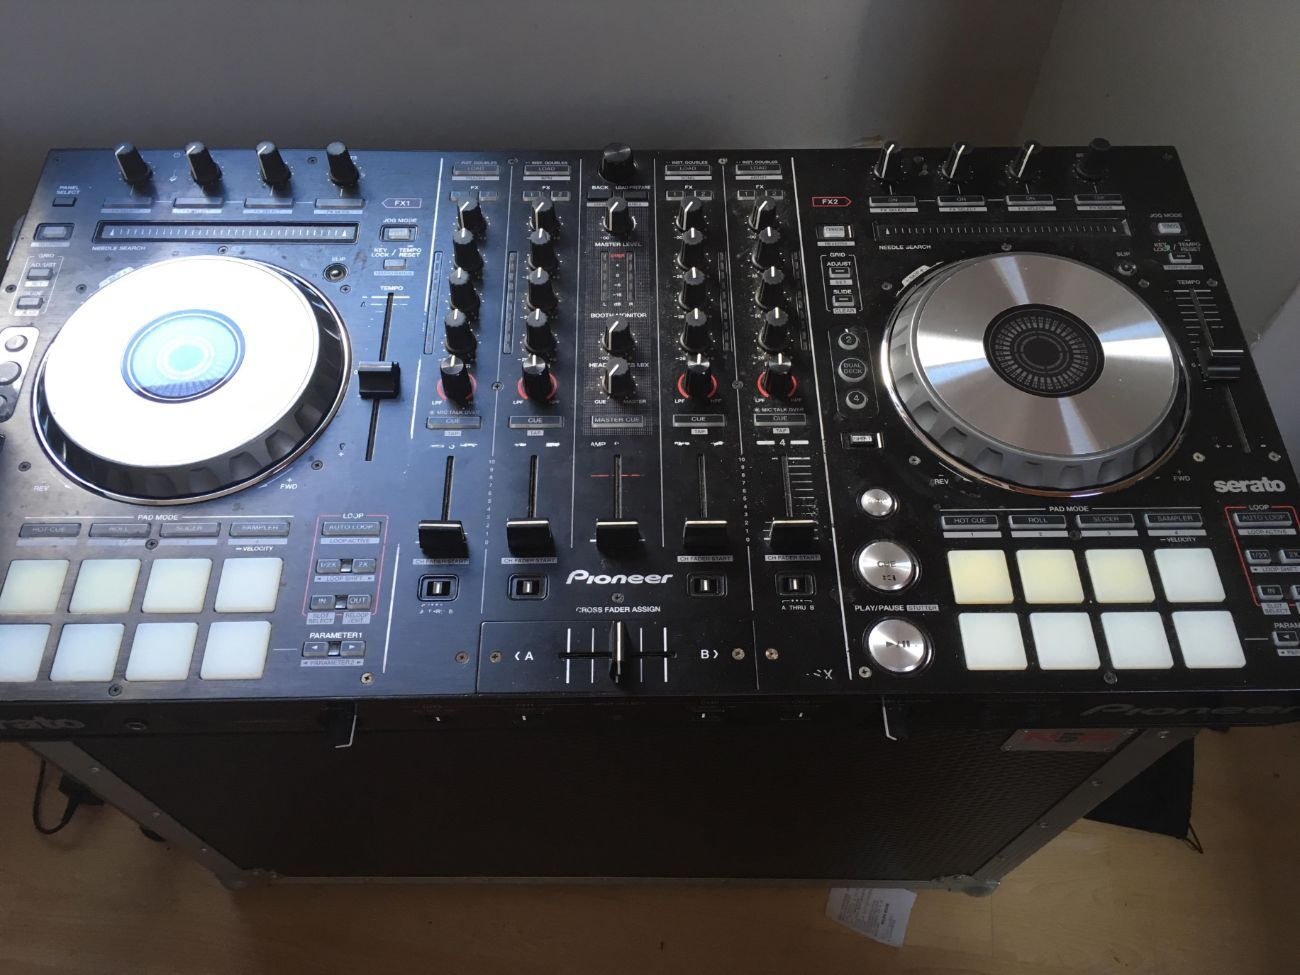 Pioneer DDJ SX DJ Controller for Serato & Rekordbox